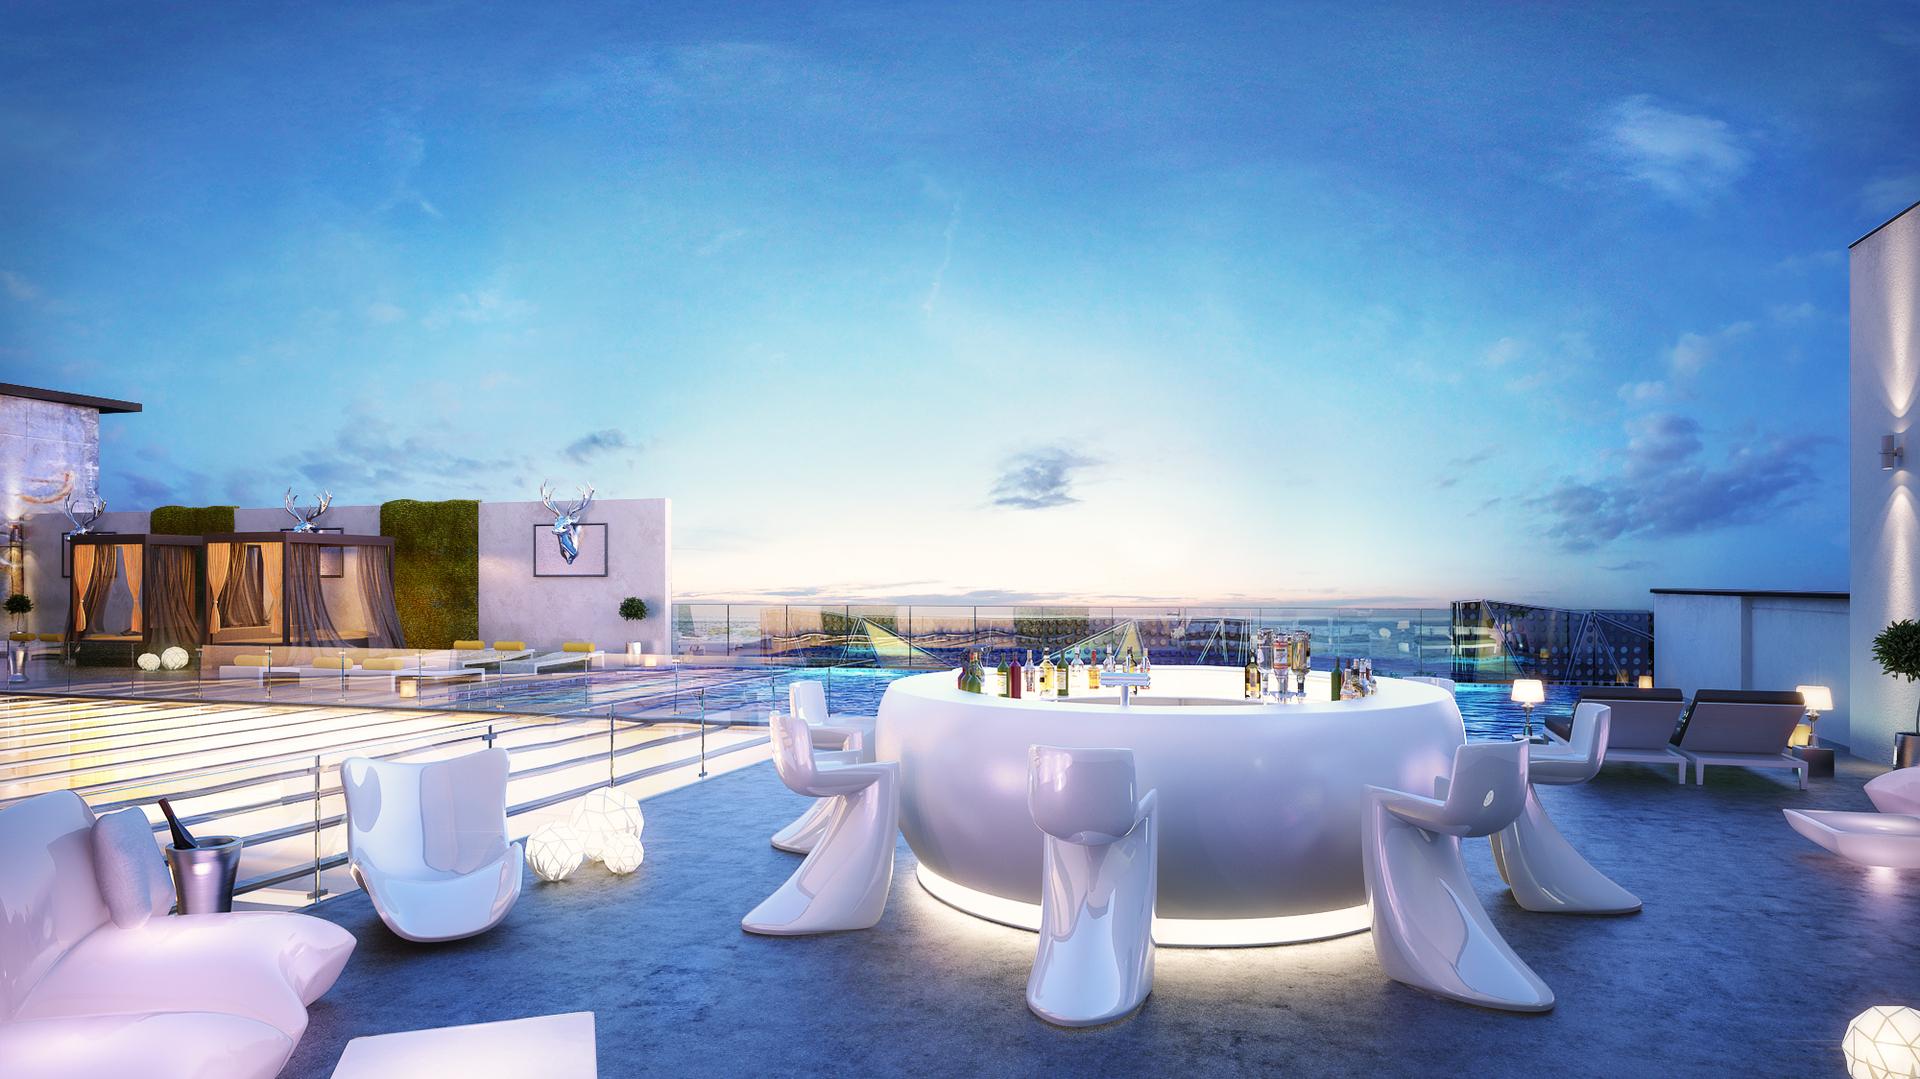 Sky Pool, The Art Hotel, Oniru. Image Source: arthotelng.com